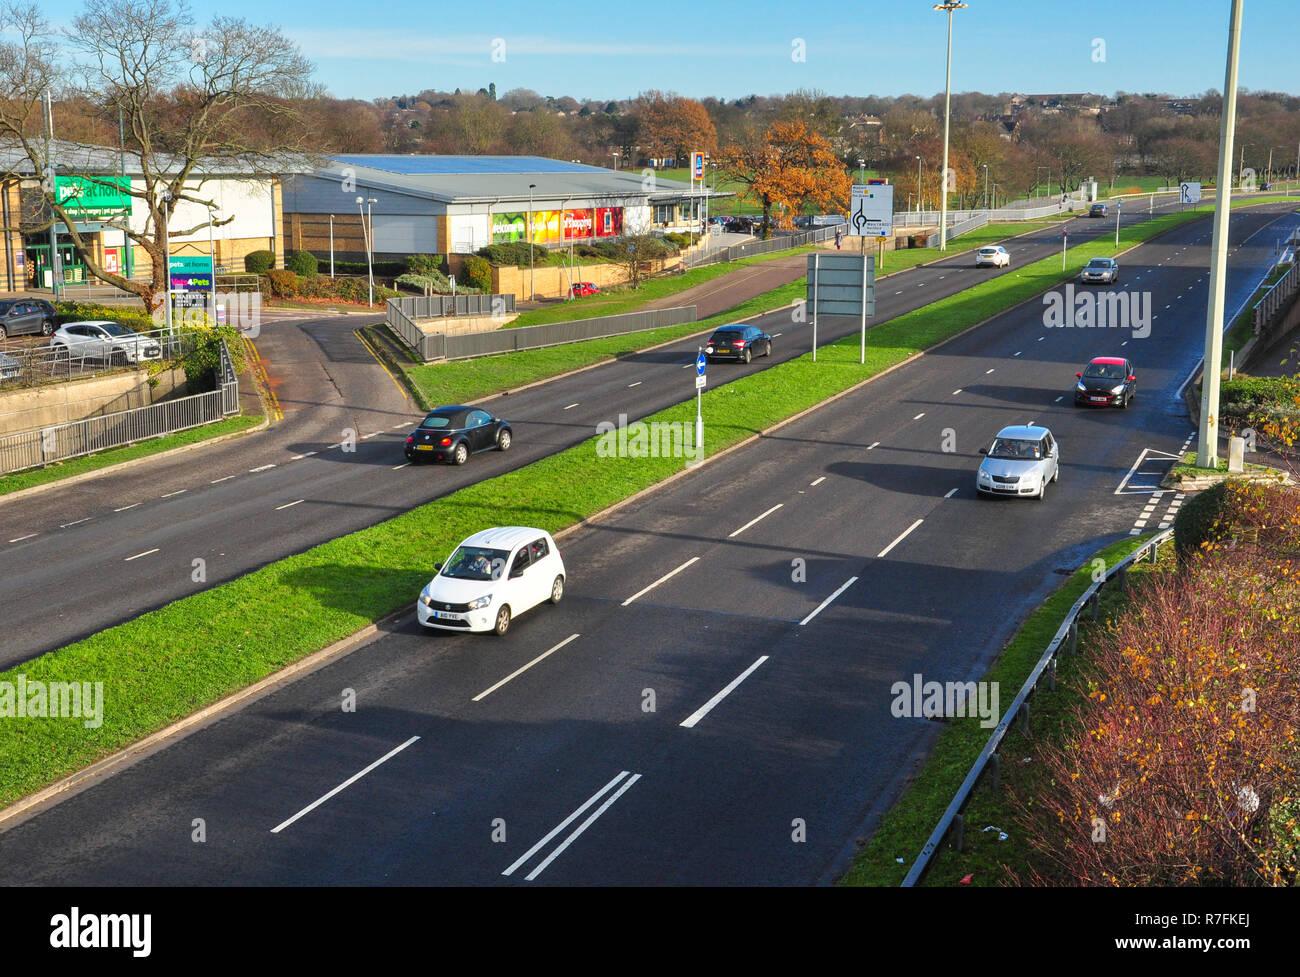 Road traffic on urban dual carriageway, Stevenage, Hertfordshire, England, UK - Stock Image